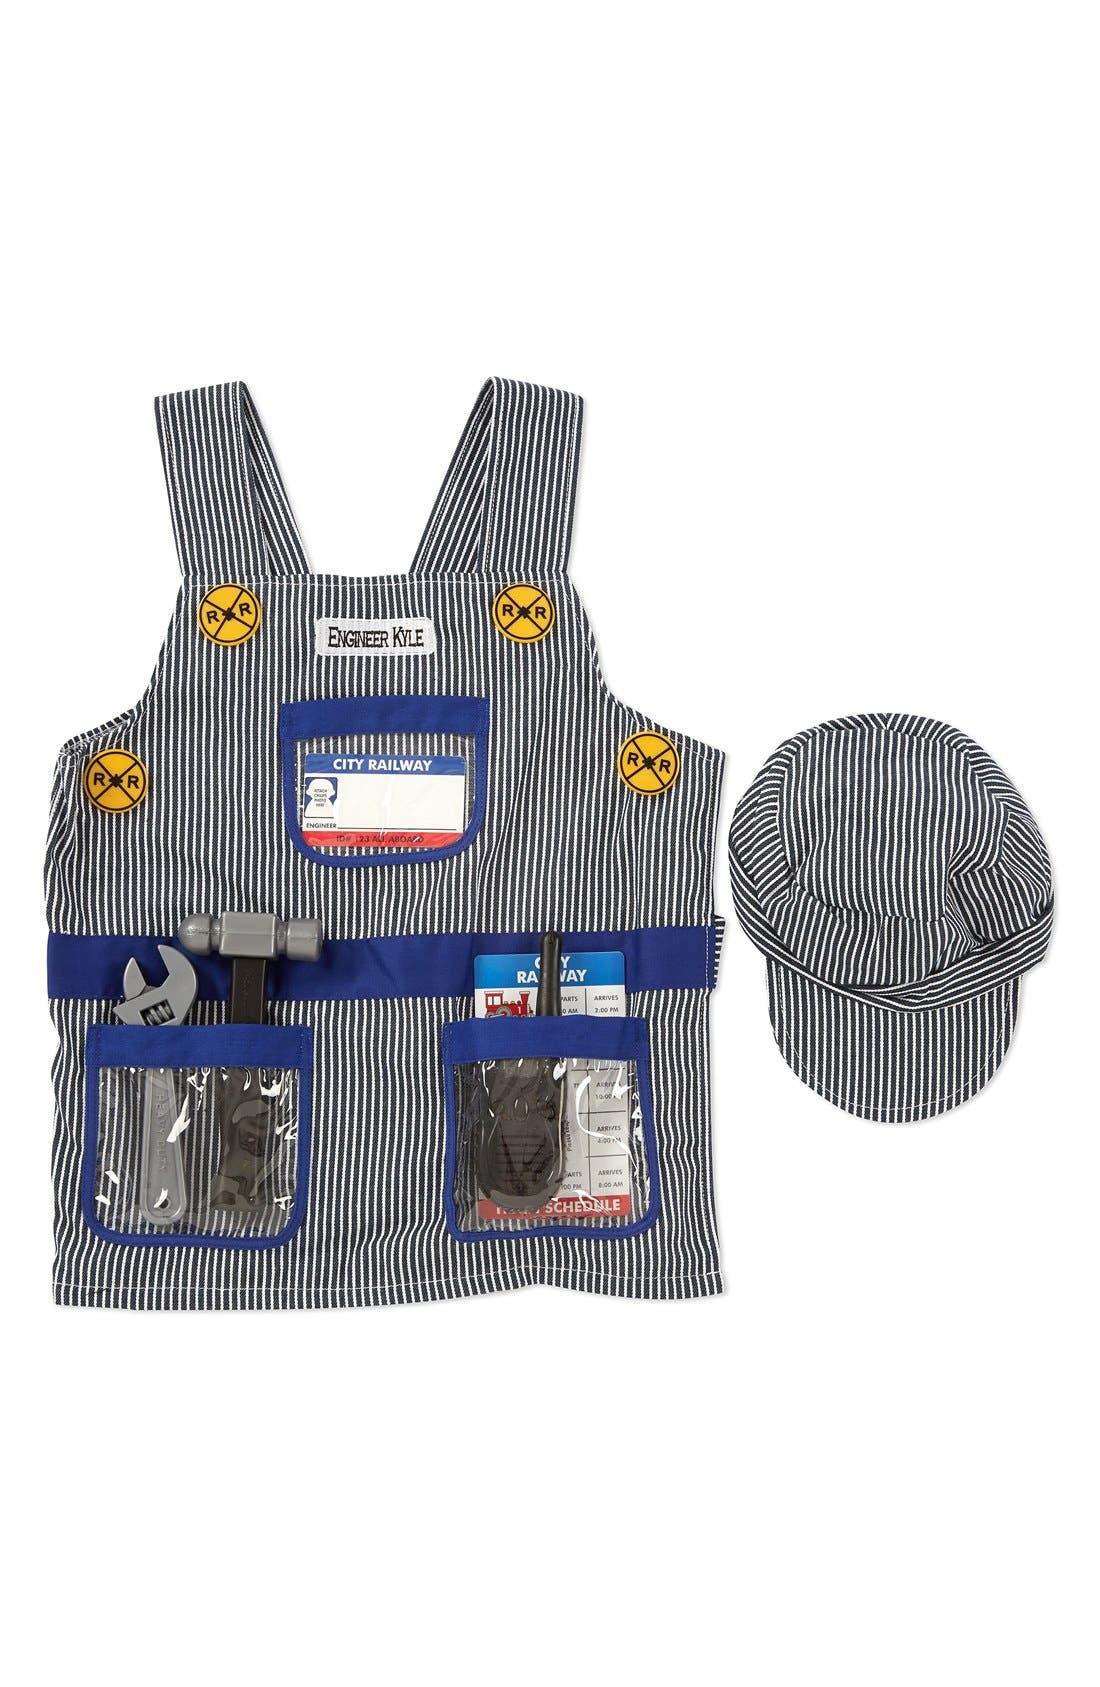 Alternate Image 1 Selected - Melissa & Doug 'Train Engineer' Personalized Costume Set (Little Kid)